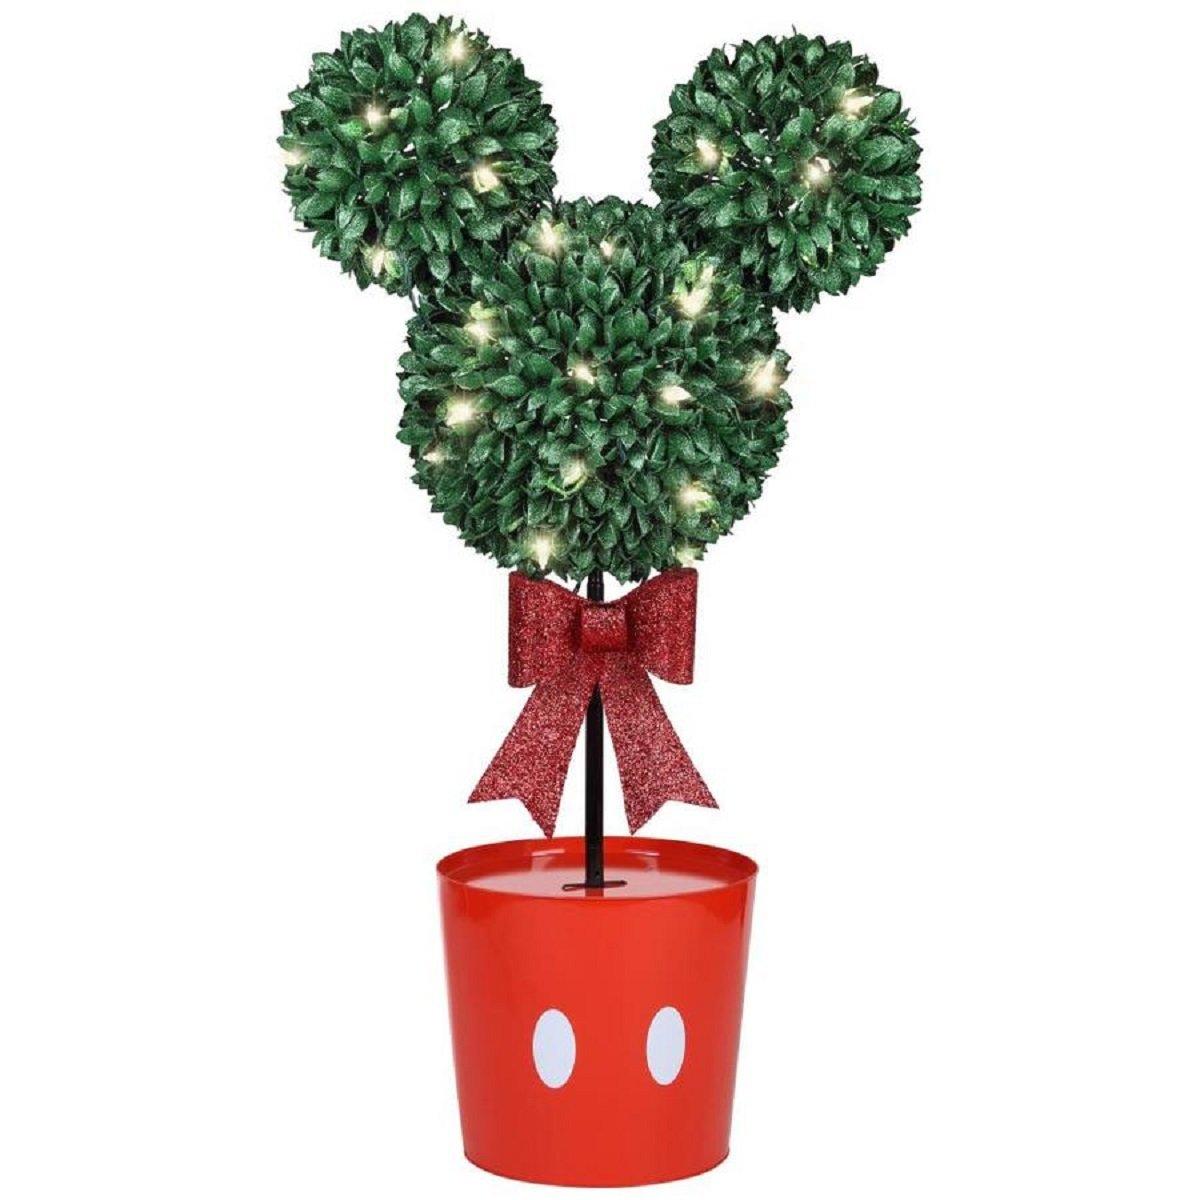 Disney Mickey Mouse LED Topiary Tree Christmas Decoration